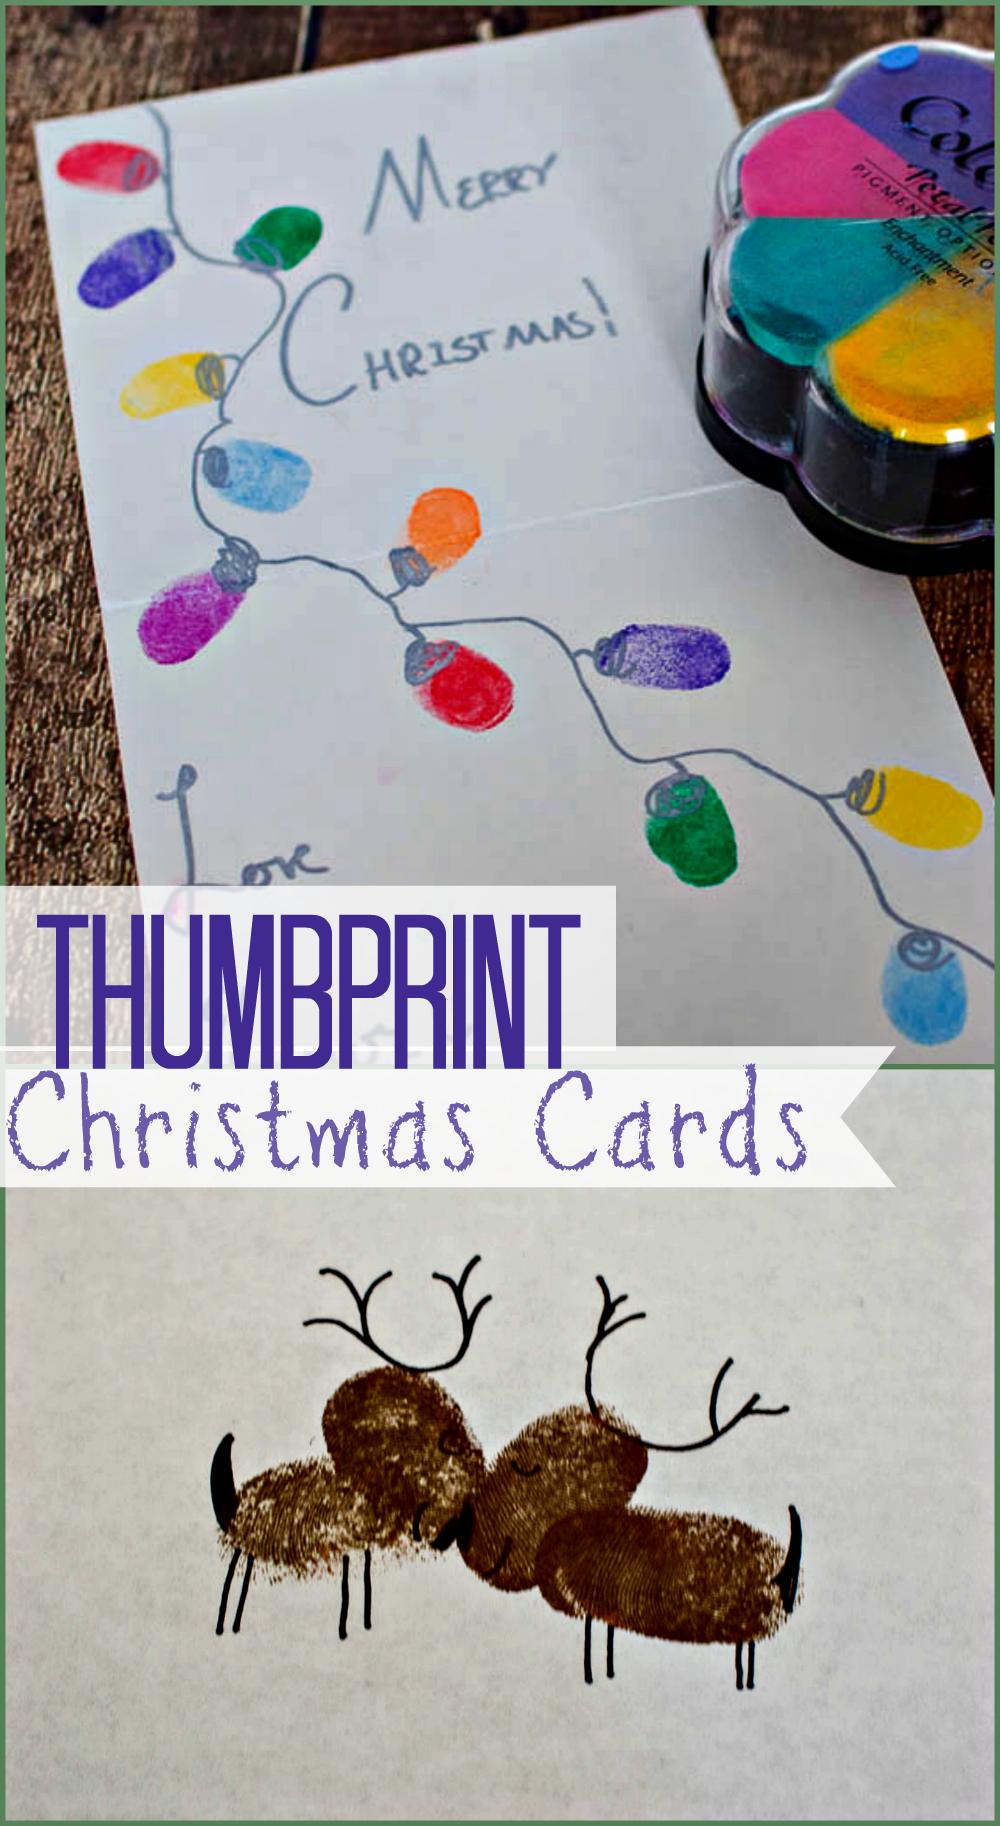 Thumbprint Christmas Cards Holiday Cards Diy Christmas Cards Kids Christmas Crafts Homemade Cards Diy Thumbprint Reindeer Thumbprint Christmas Light